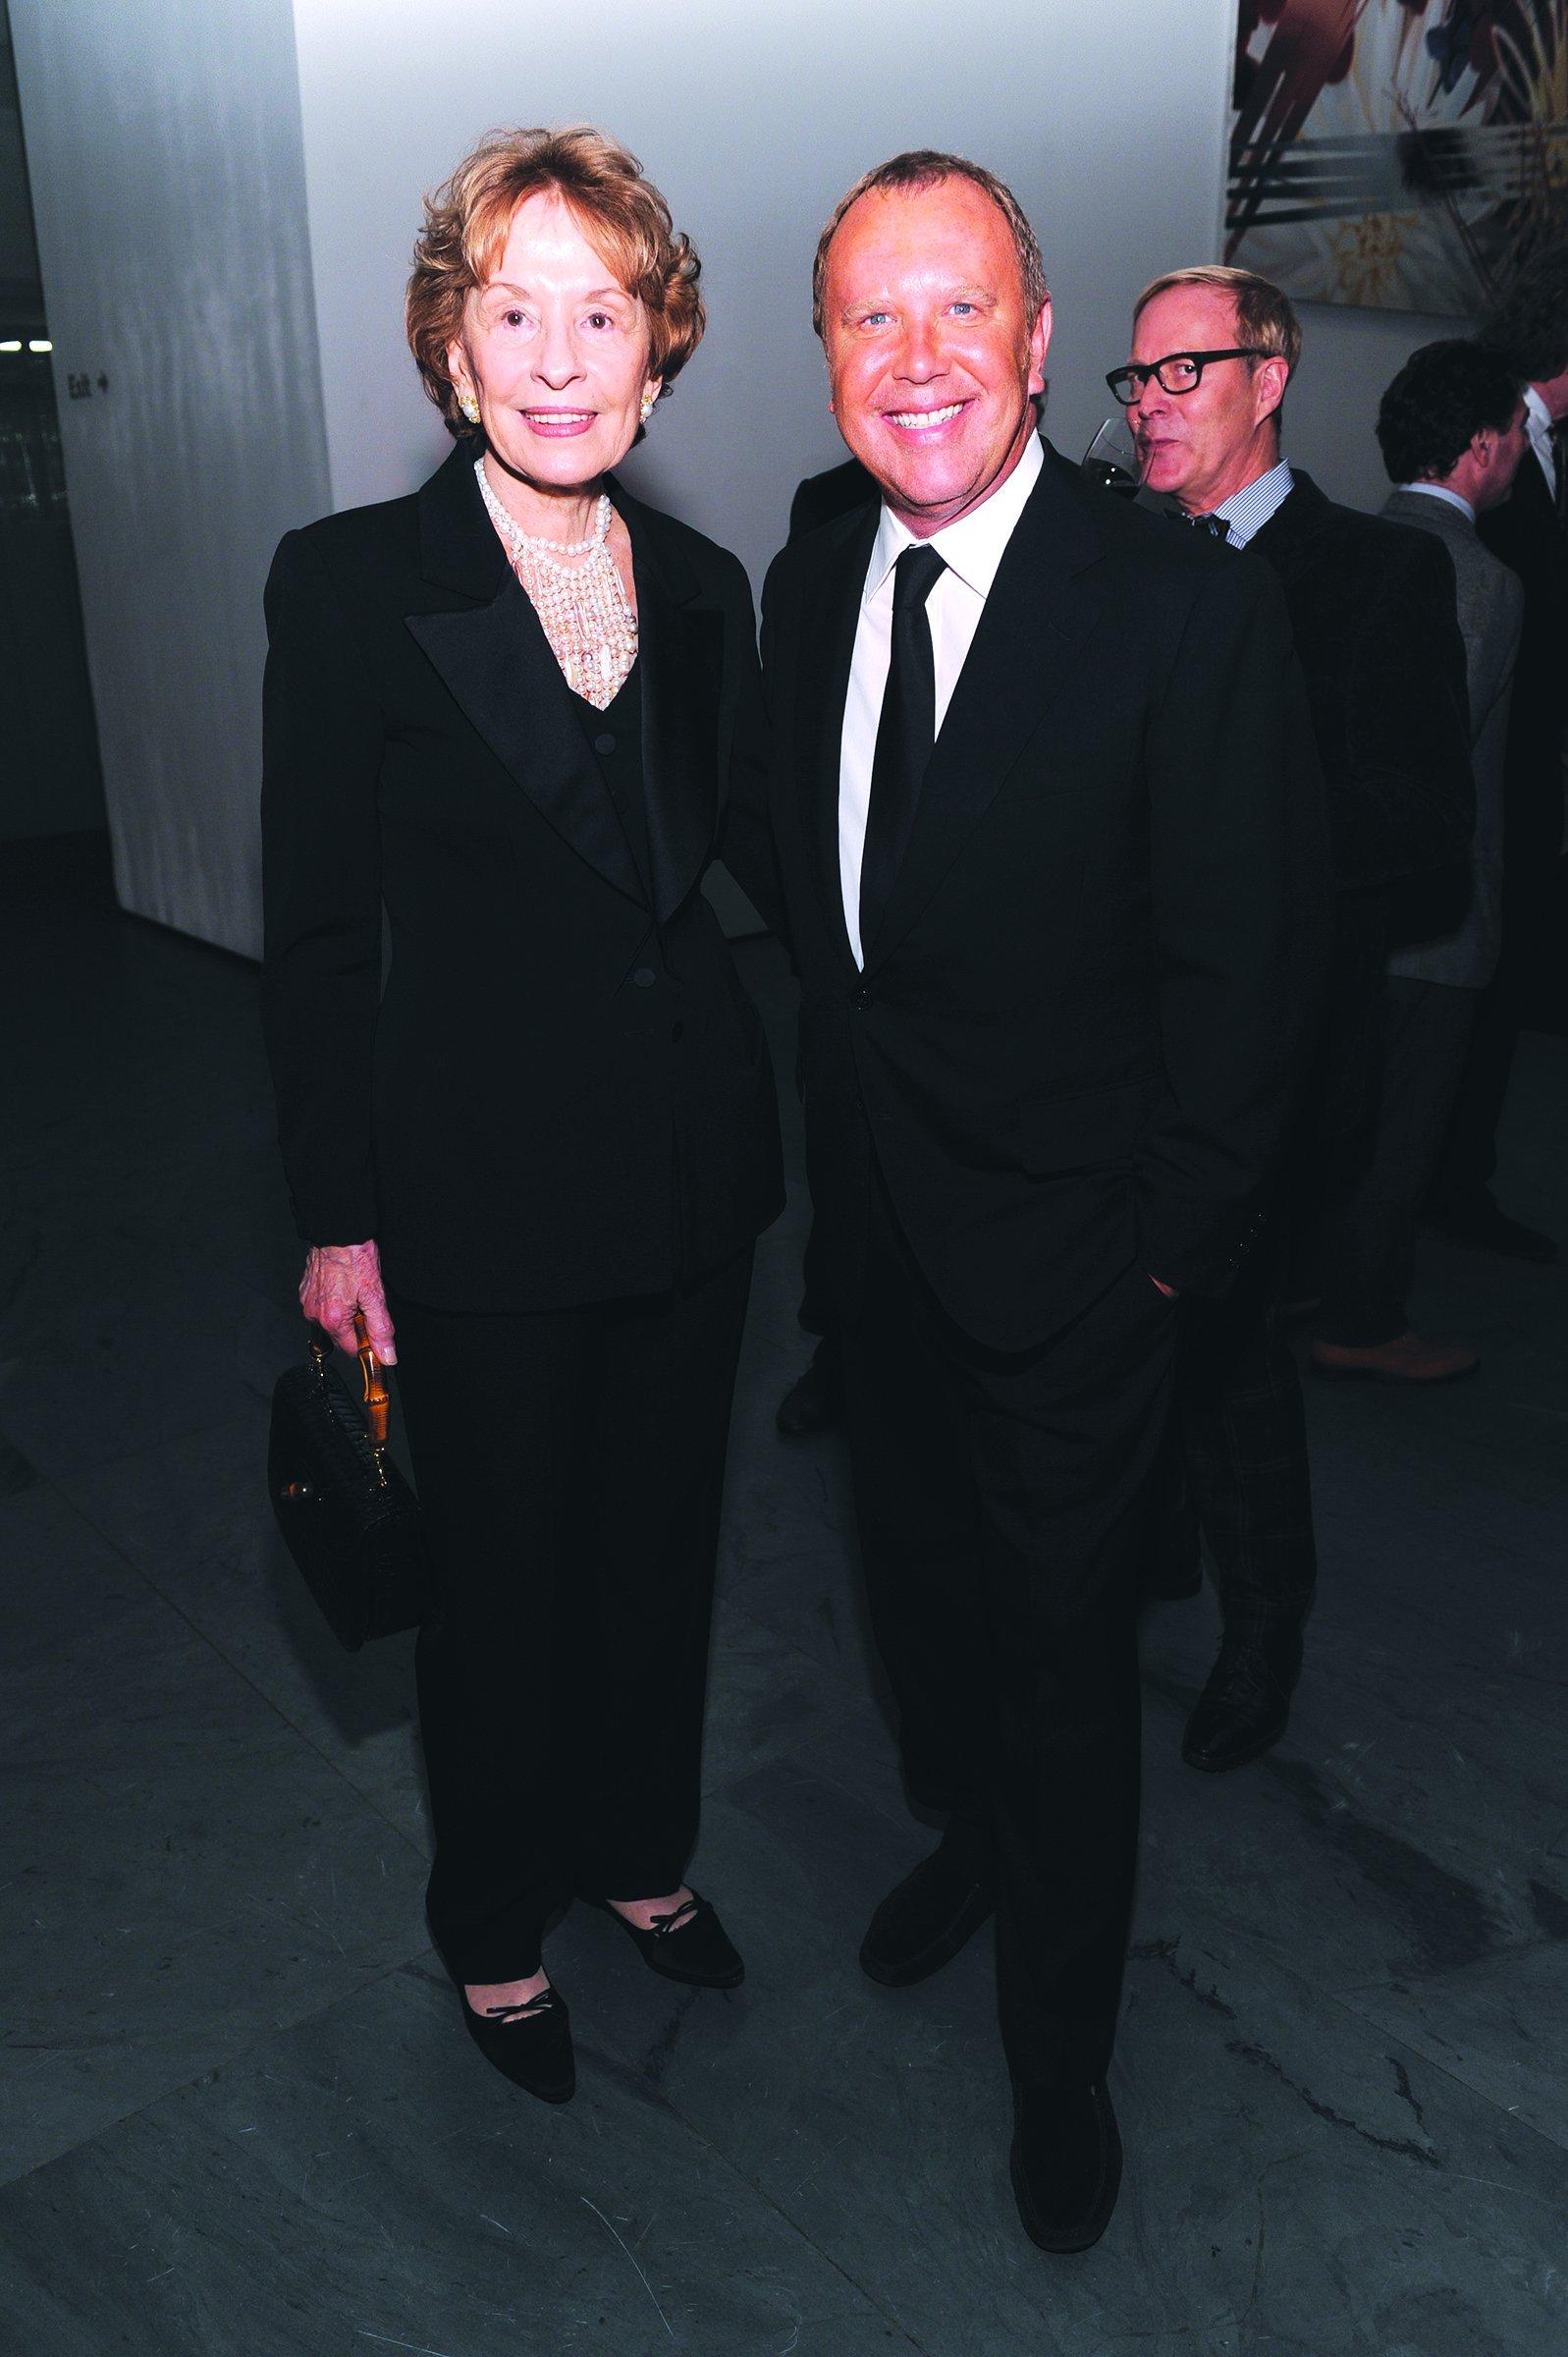 Dawn Mello and Michael Kors